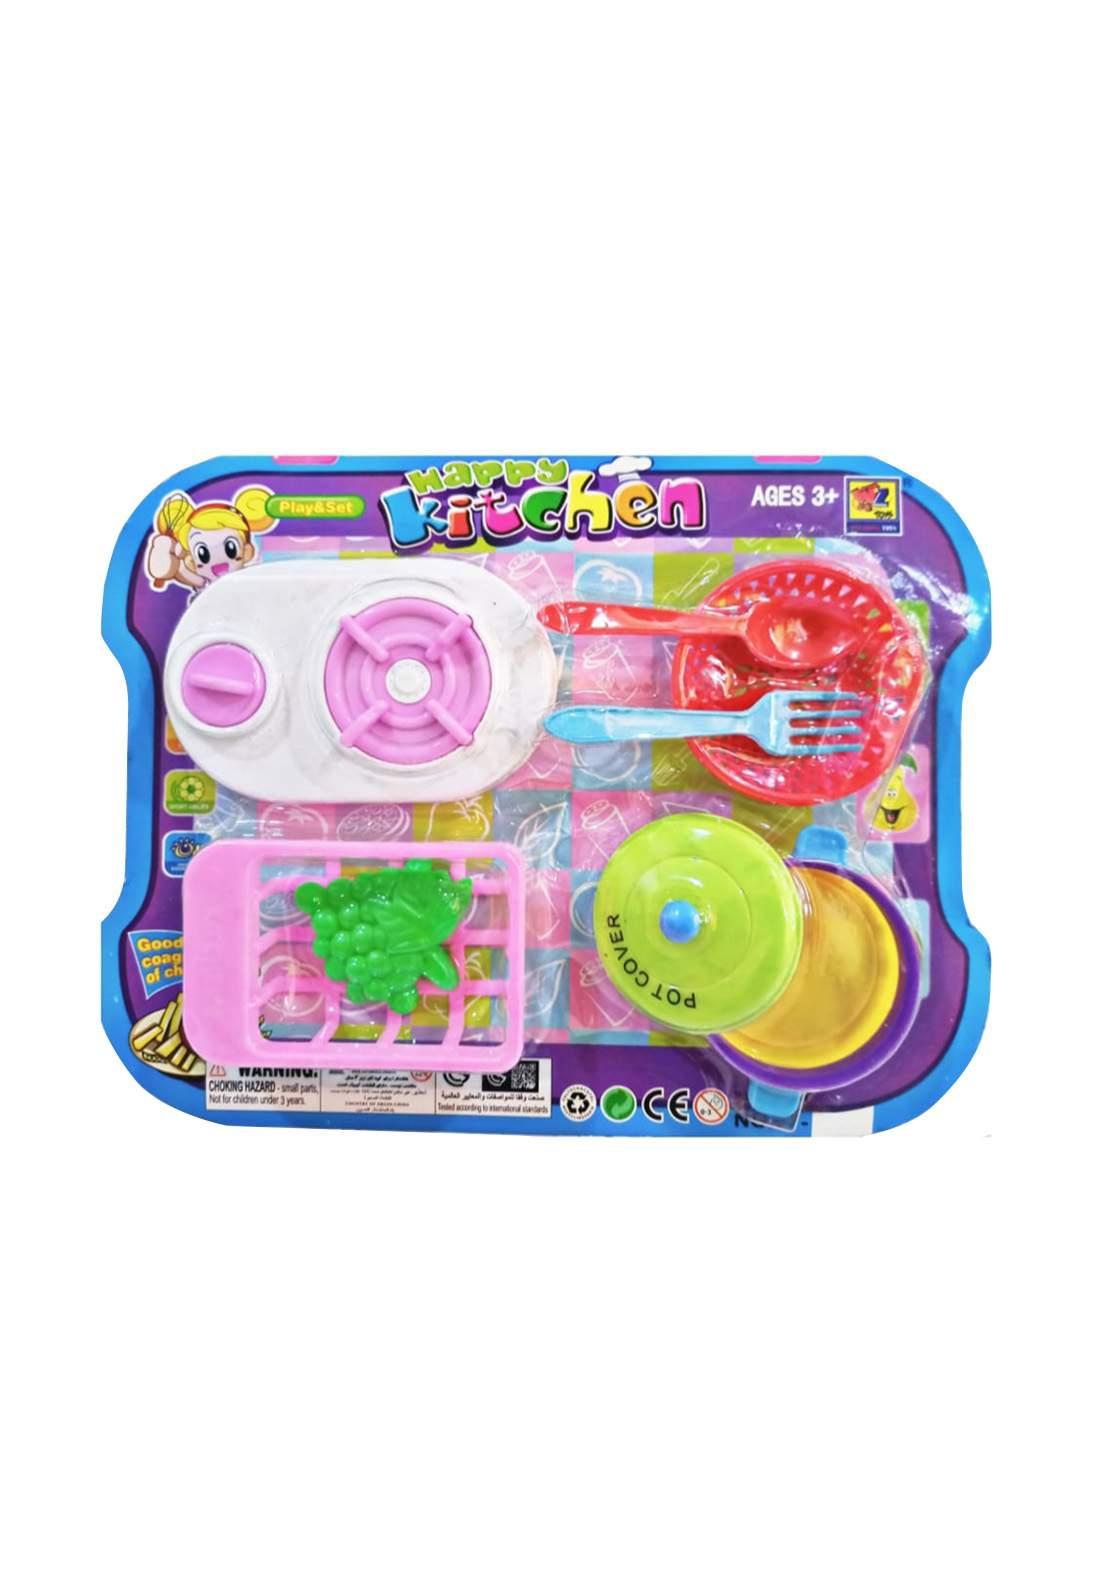 Kitchen Tools Toys لعبة أدوات الطبخ للأطفال